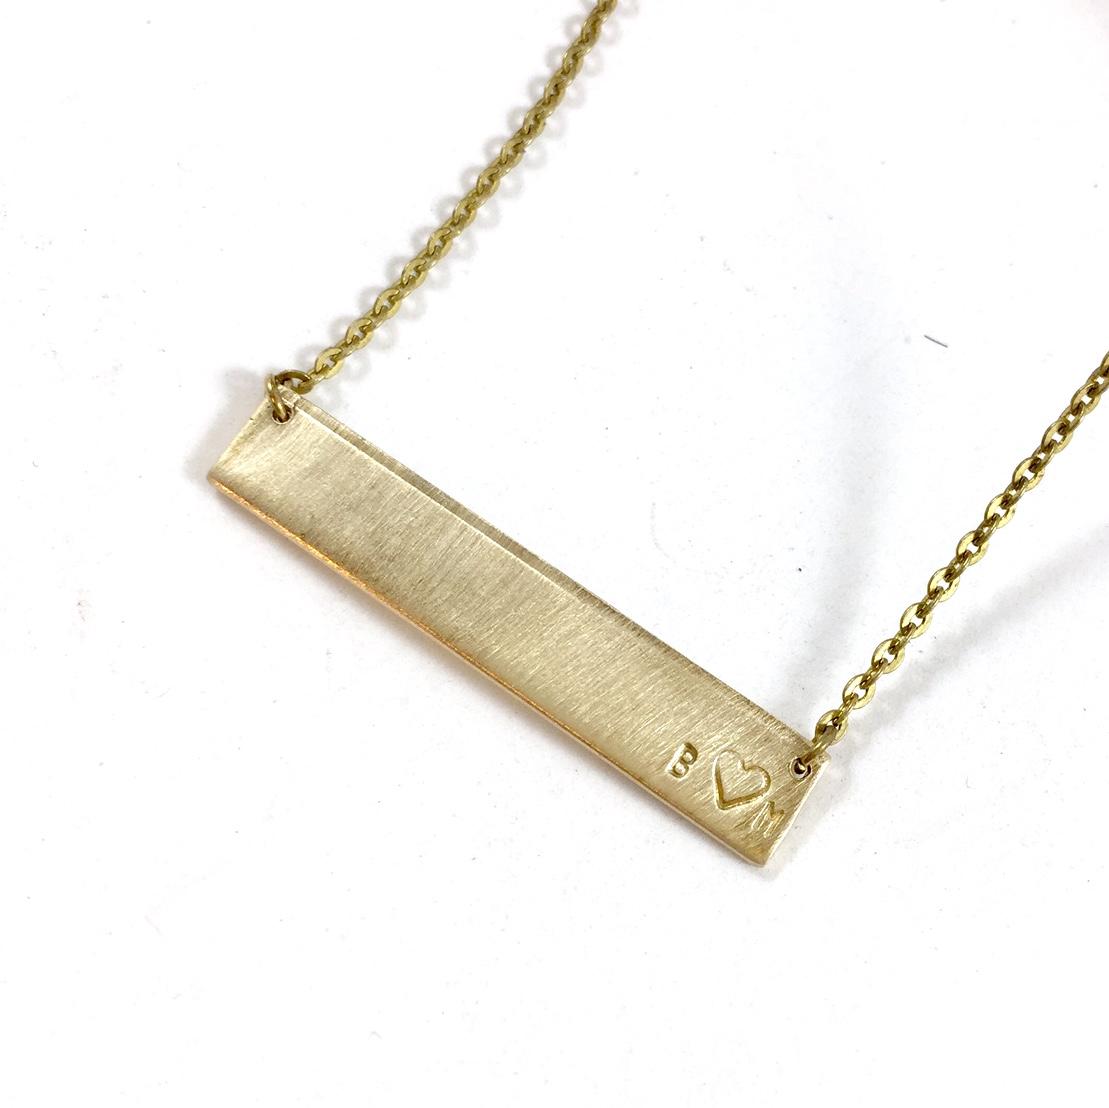 brassbarnecklace.jpg